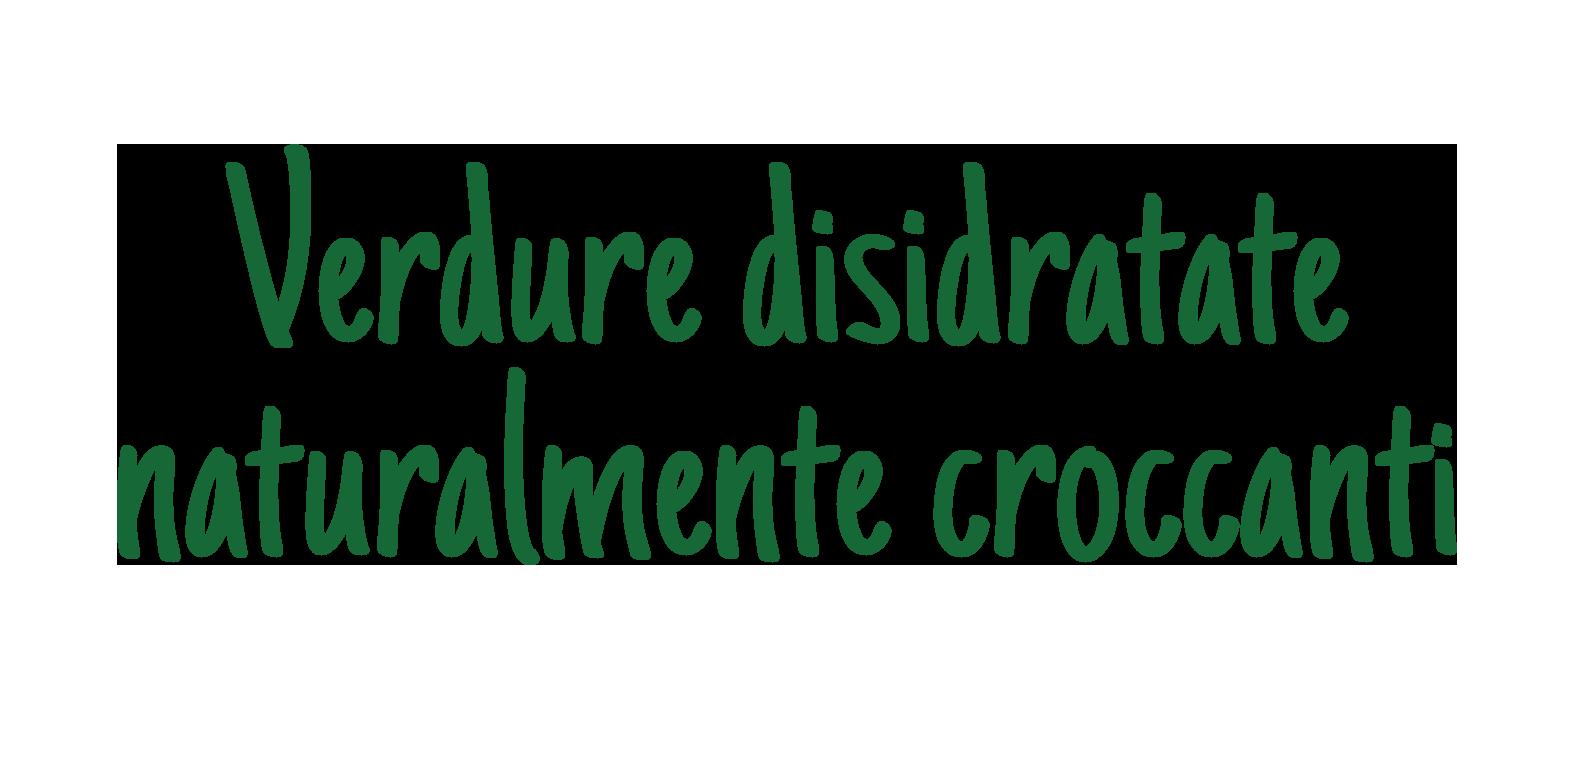 verdure disidratate naturalmente croccanti